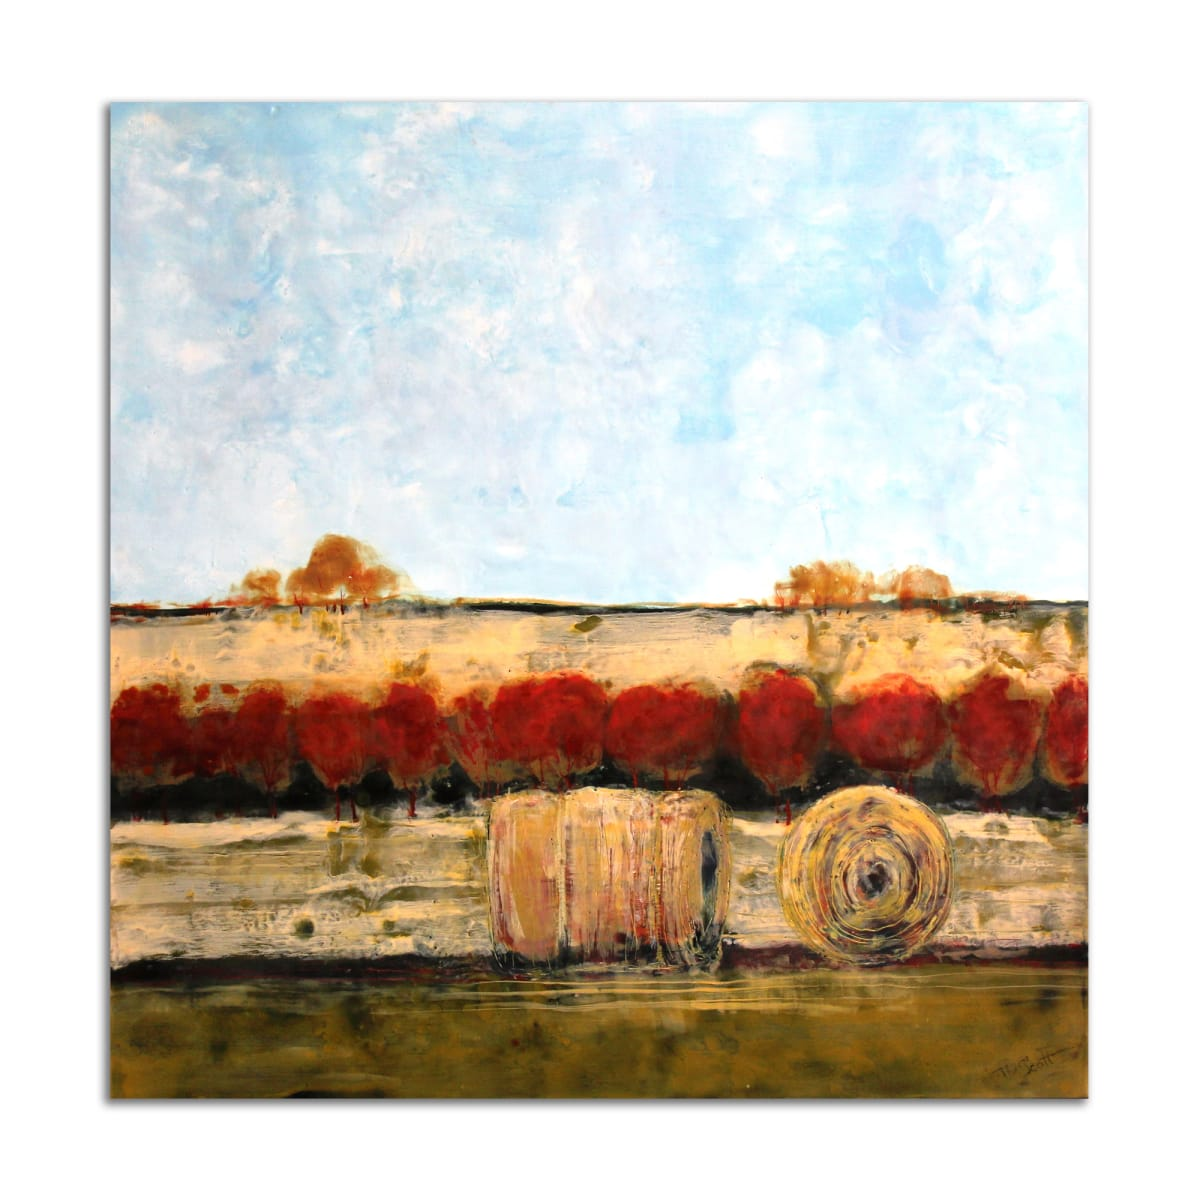 Roger's Farm by T.D. Scott